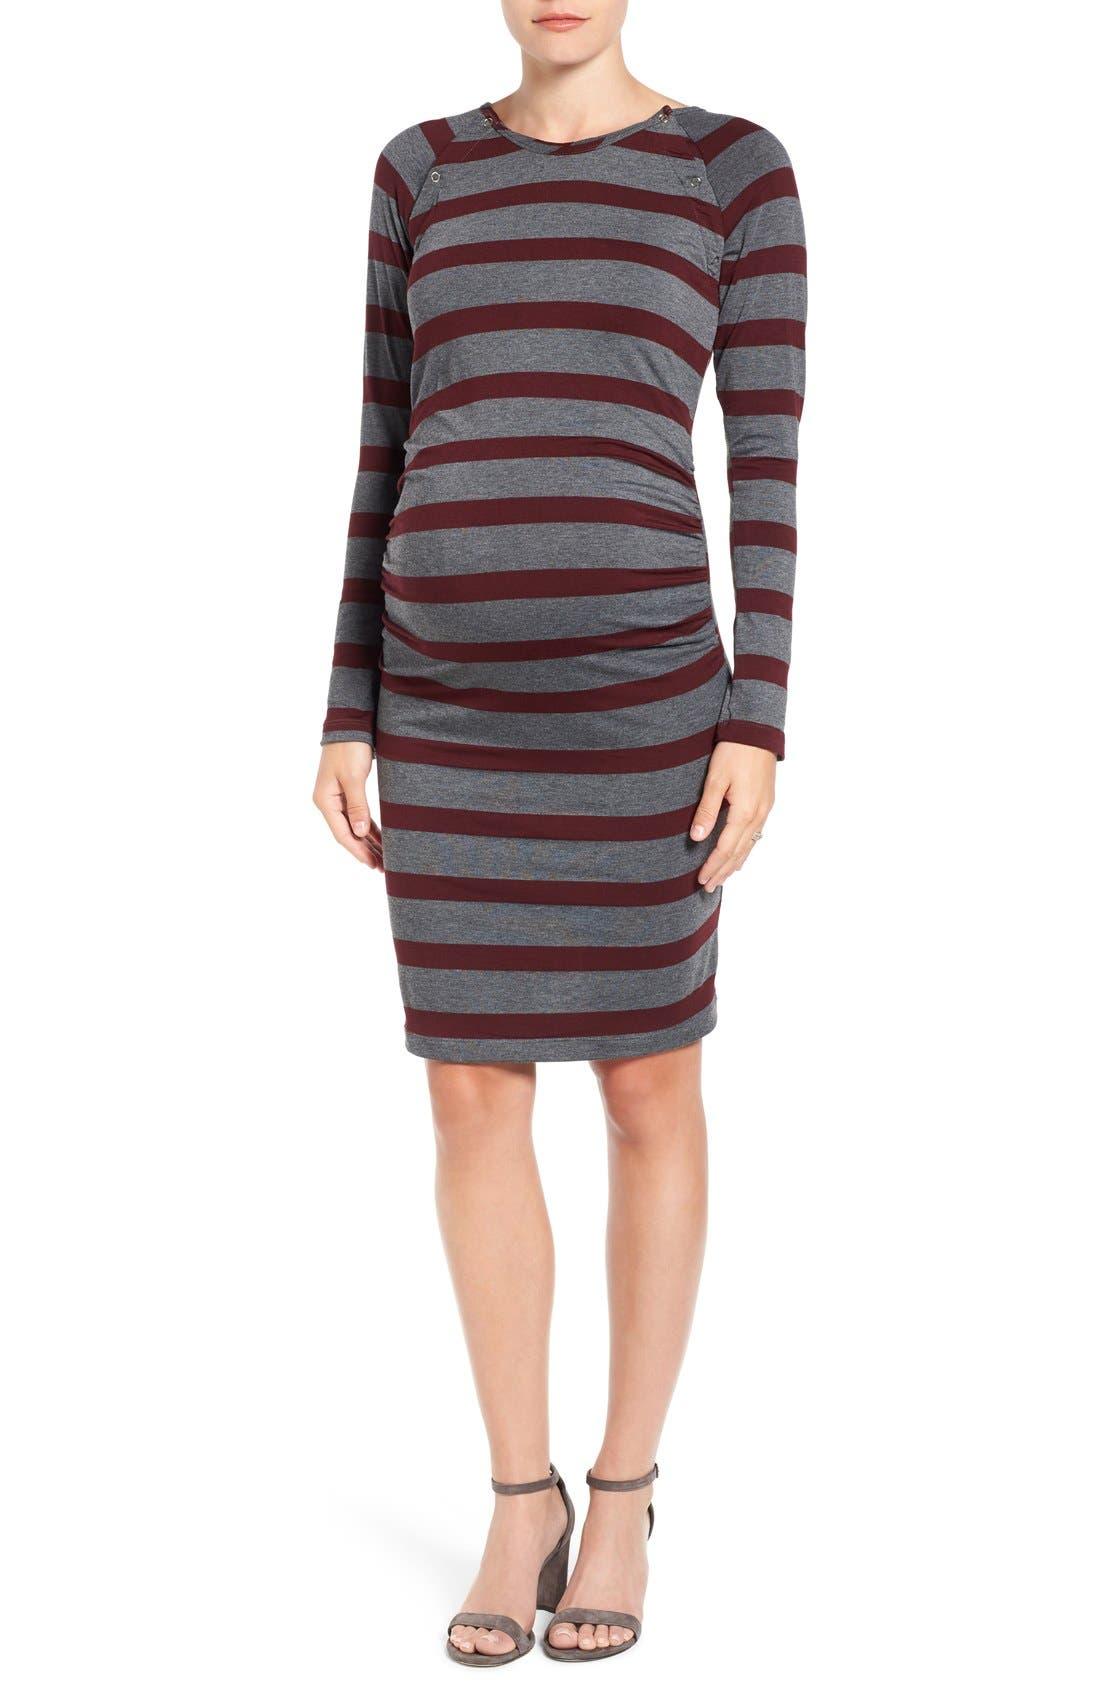 'Alex' Ruched Maternity/Nursing Dress,                         Main,                         color, Oxford/ Charcoal Stripe